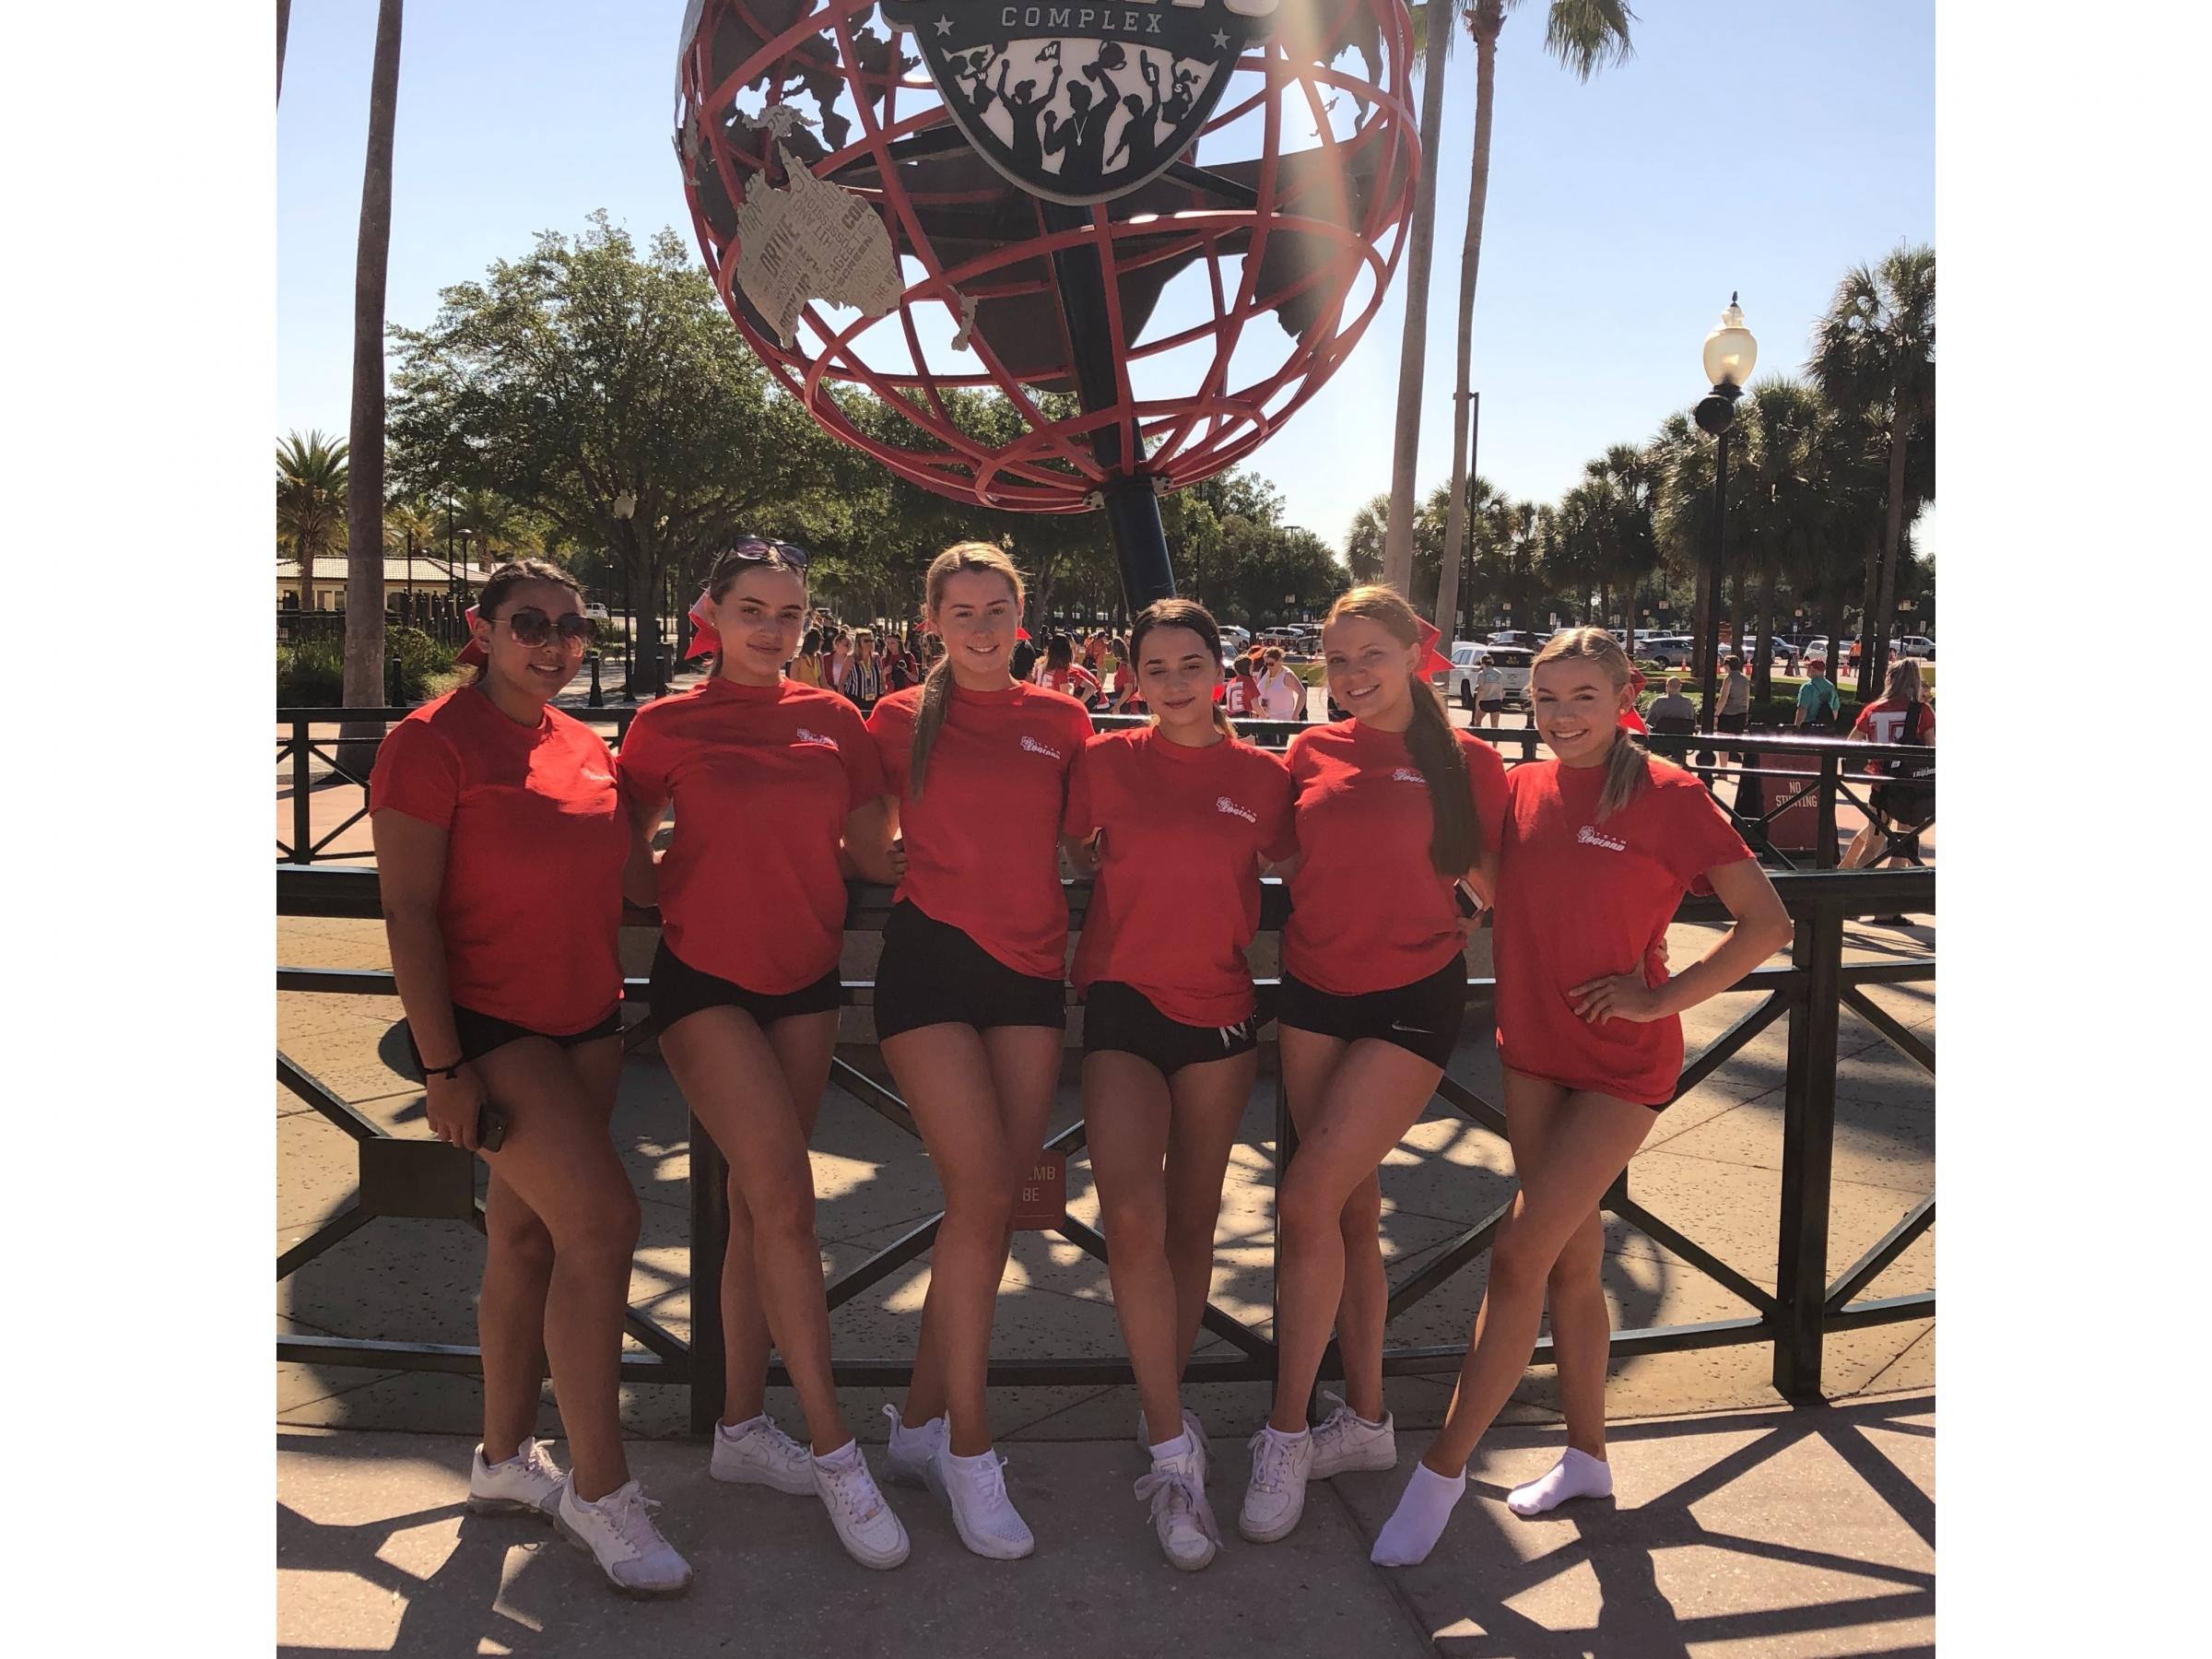 Orlando beckons Bradford cheerleaders